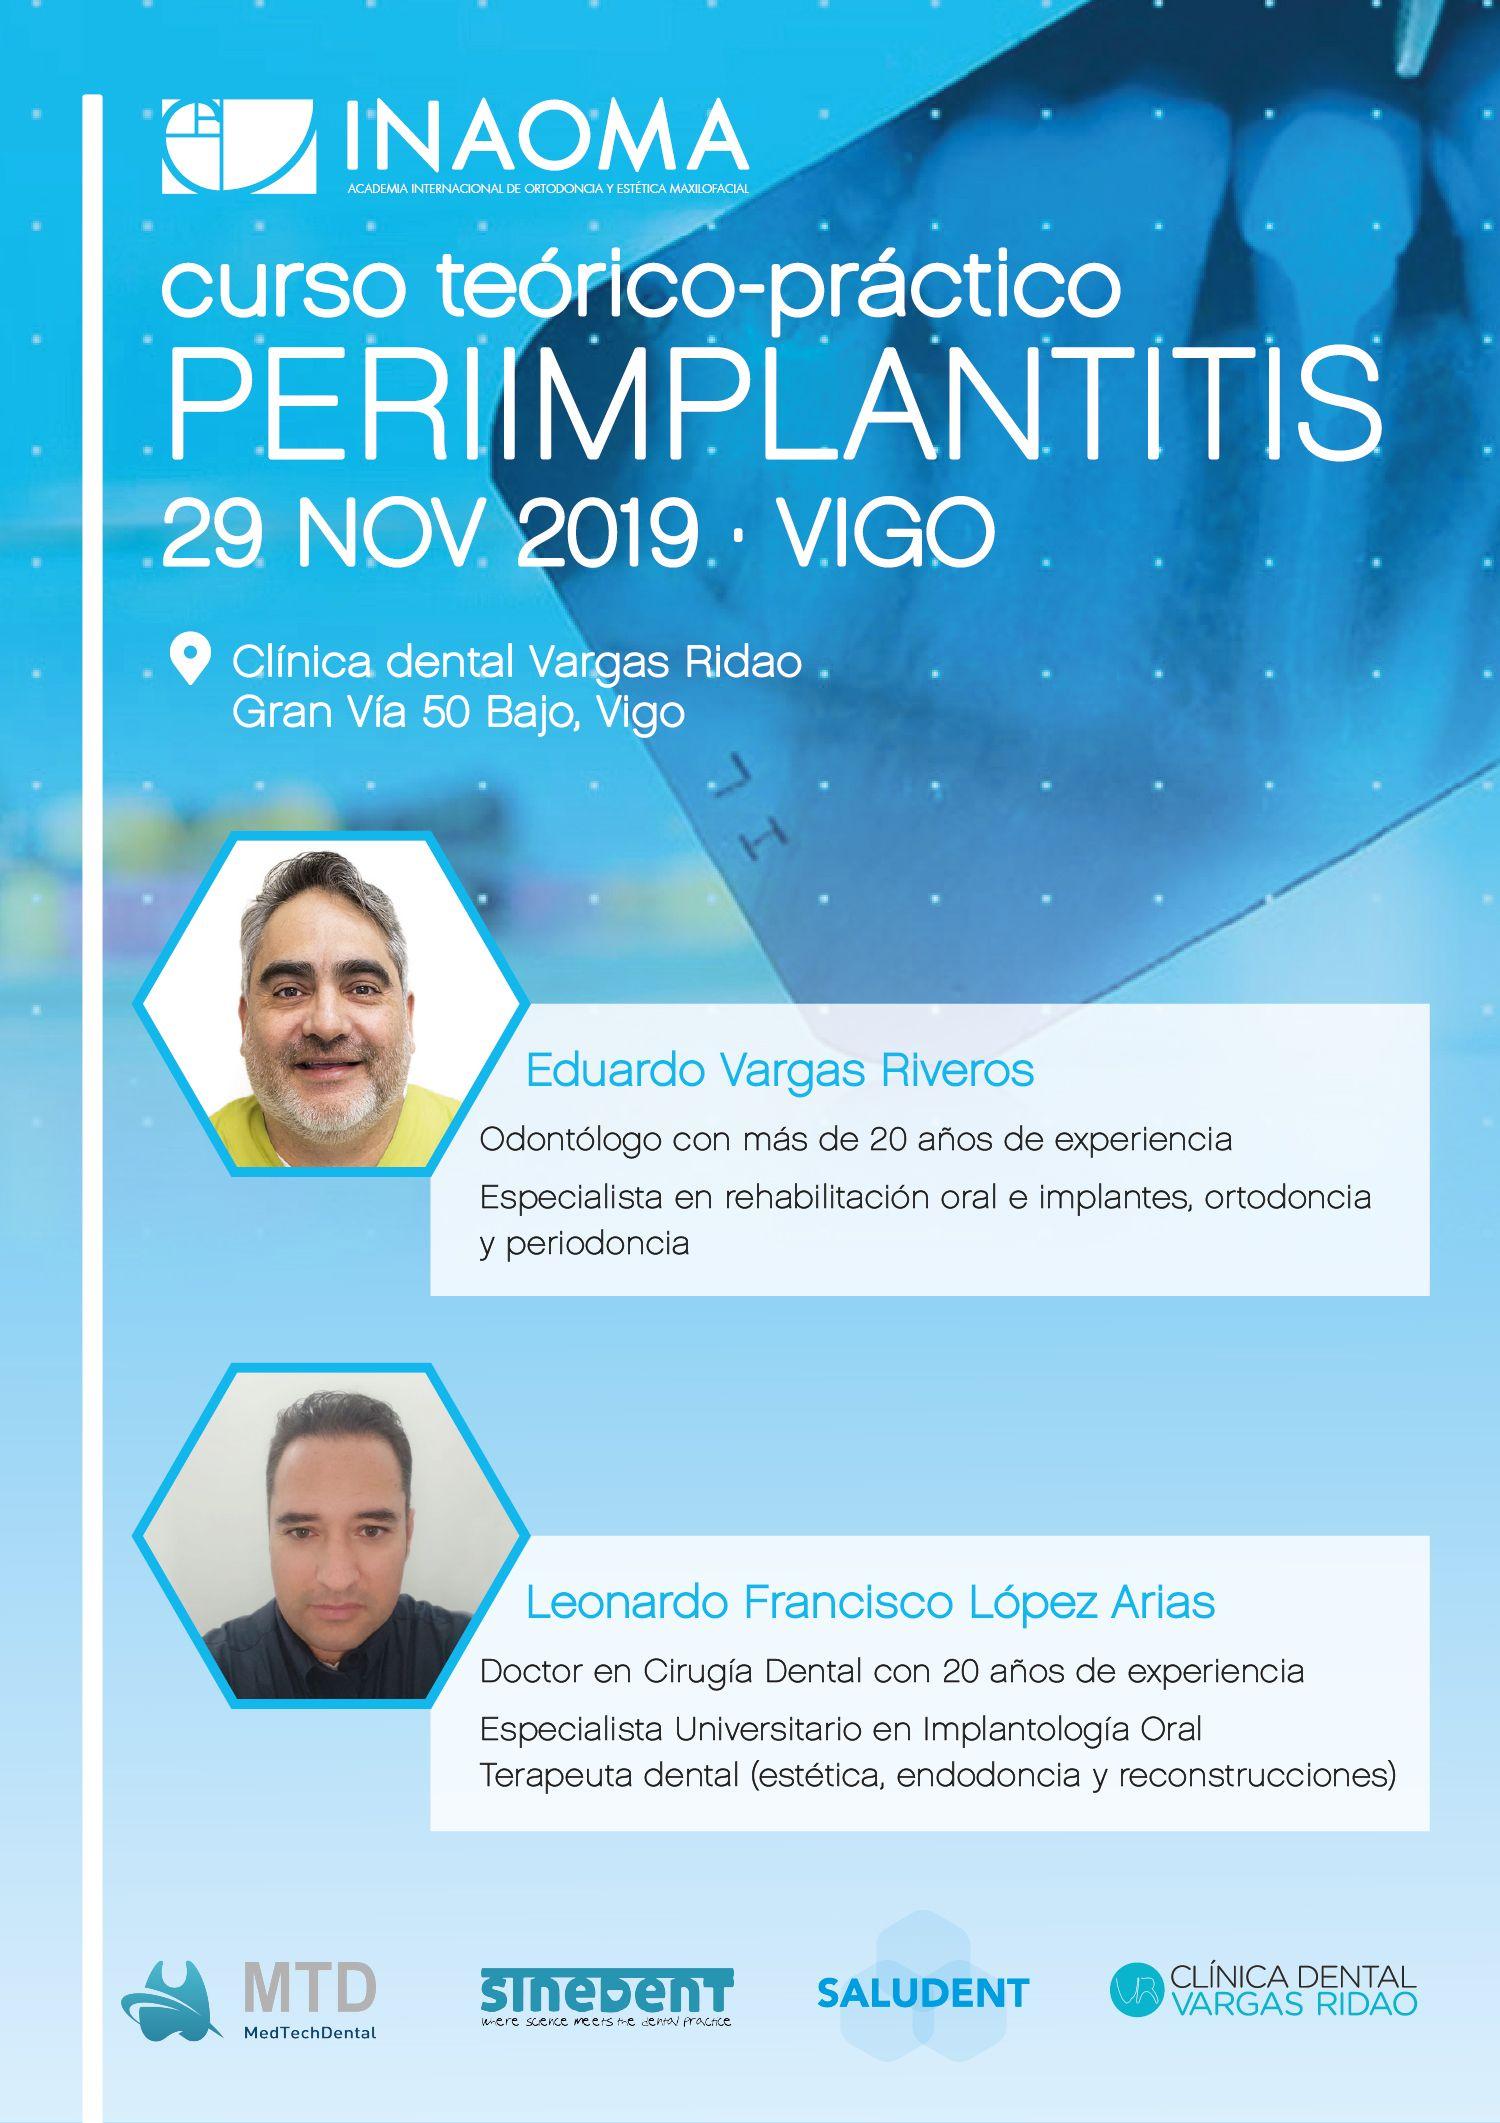 curso peri-implantitis en clínica dental vargas ridao, Vigo